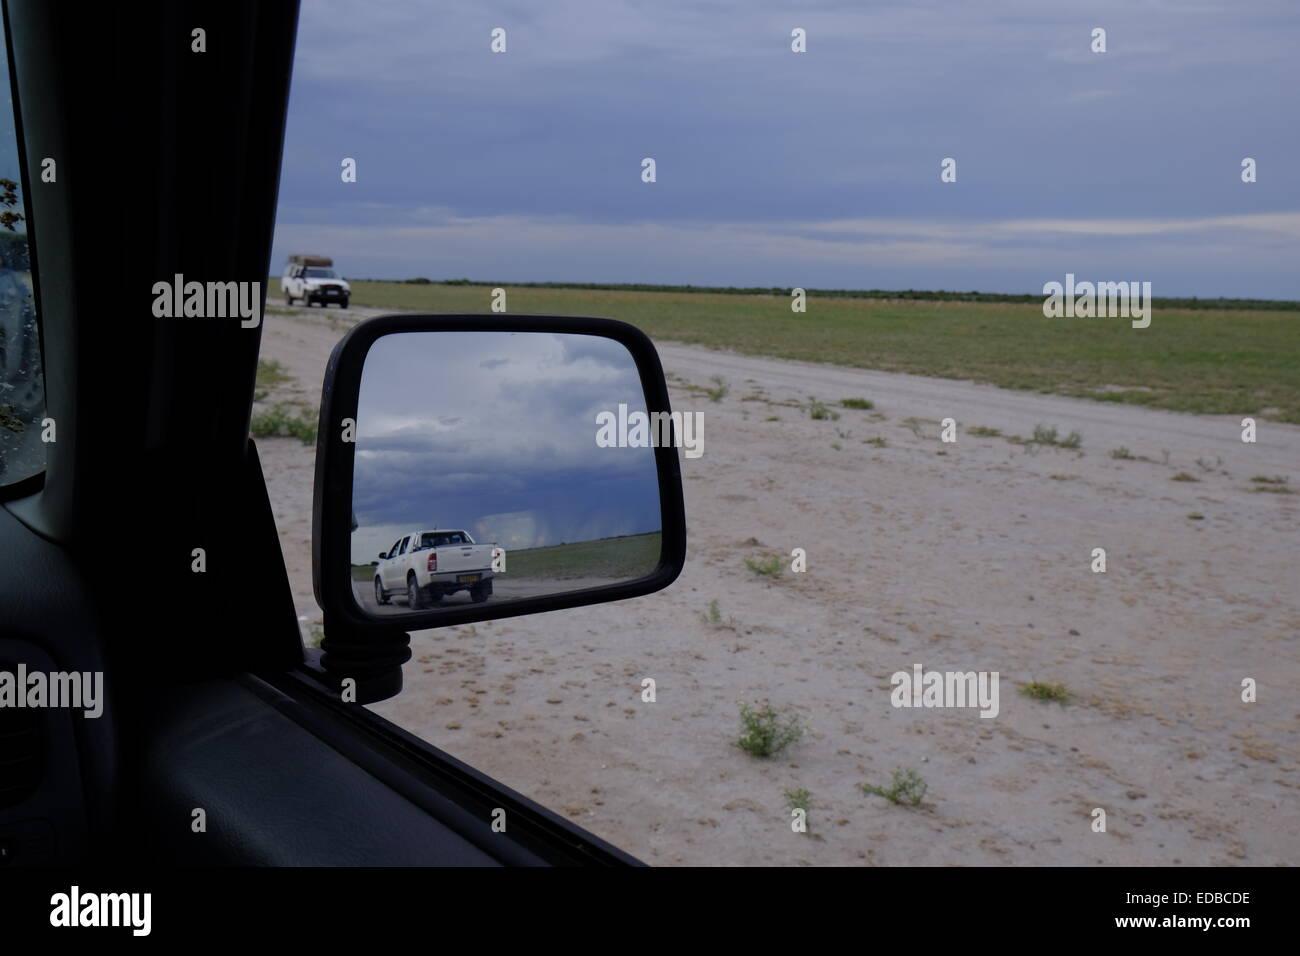 Four wheel drive game viewing vehicles in a gathering rainstorm Central Kalahari National Park Botswana. - Stock Image